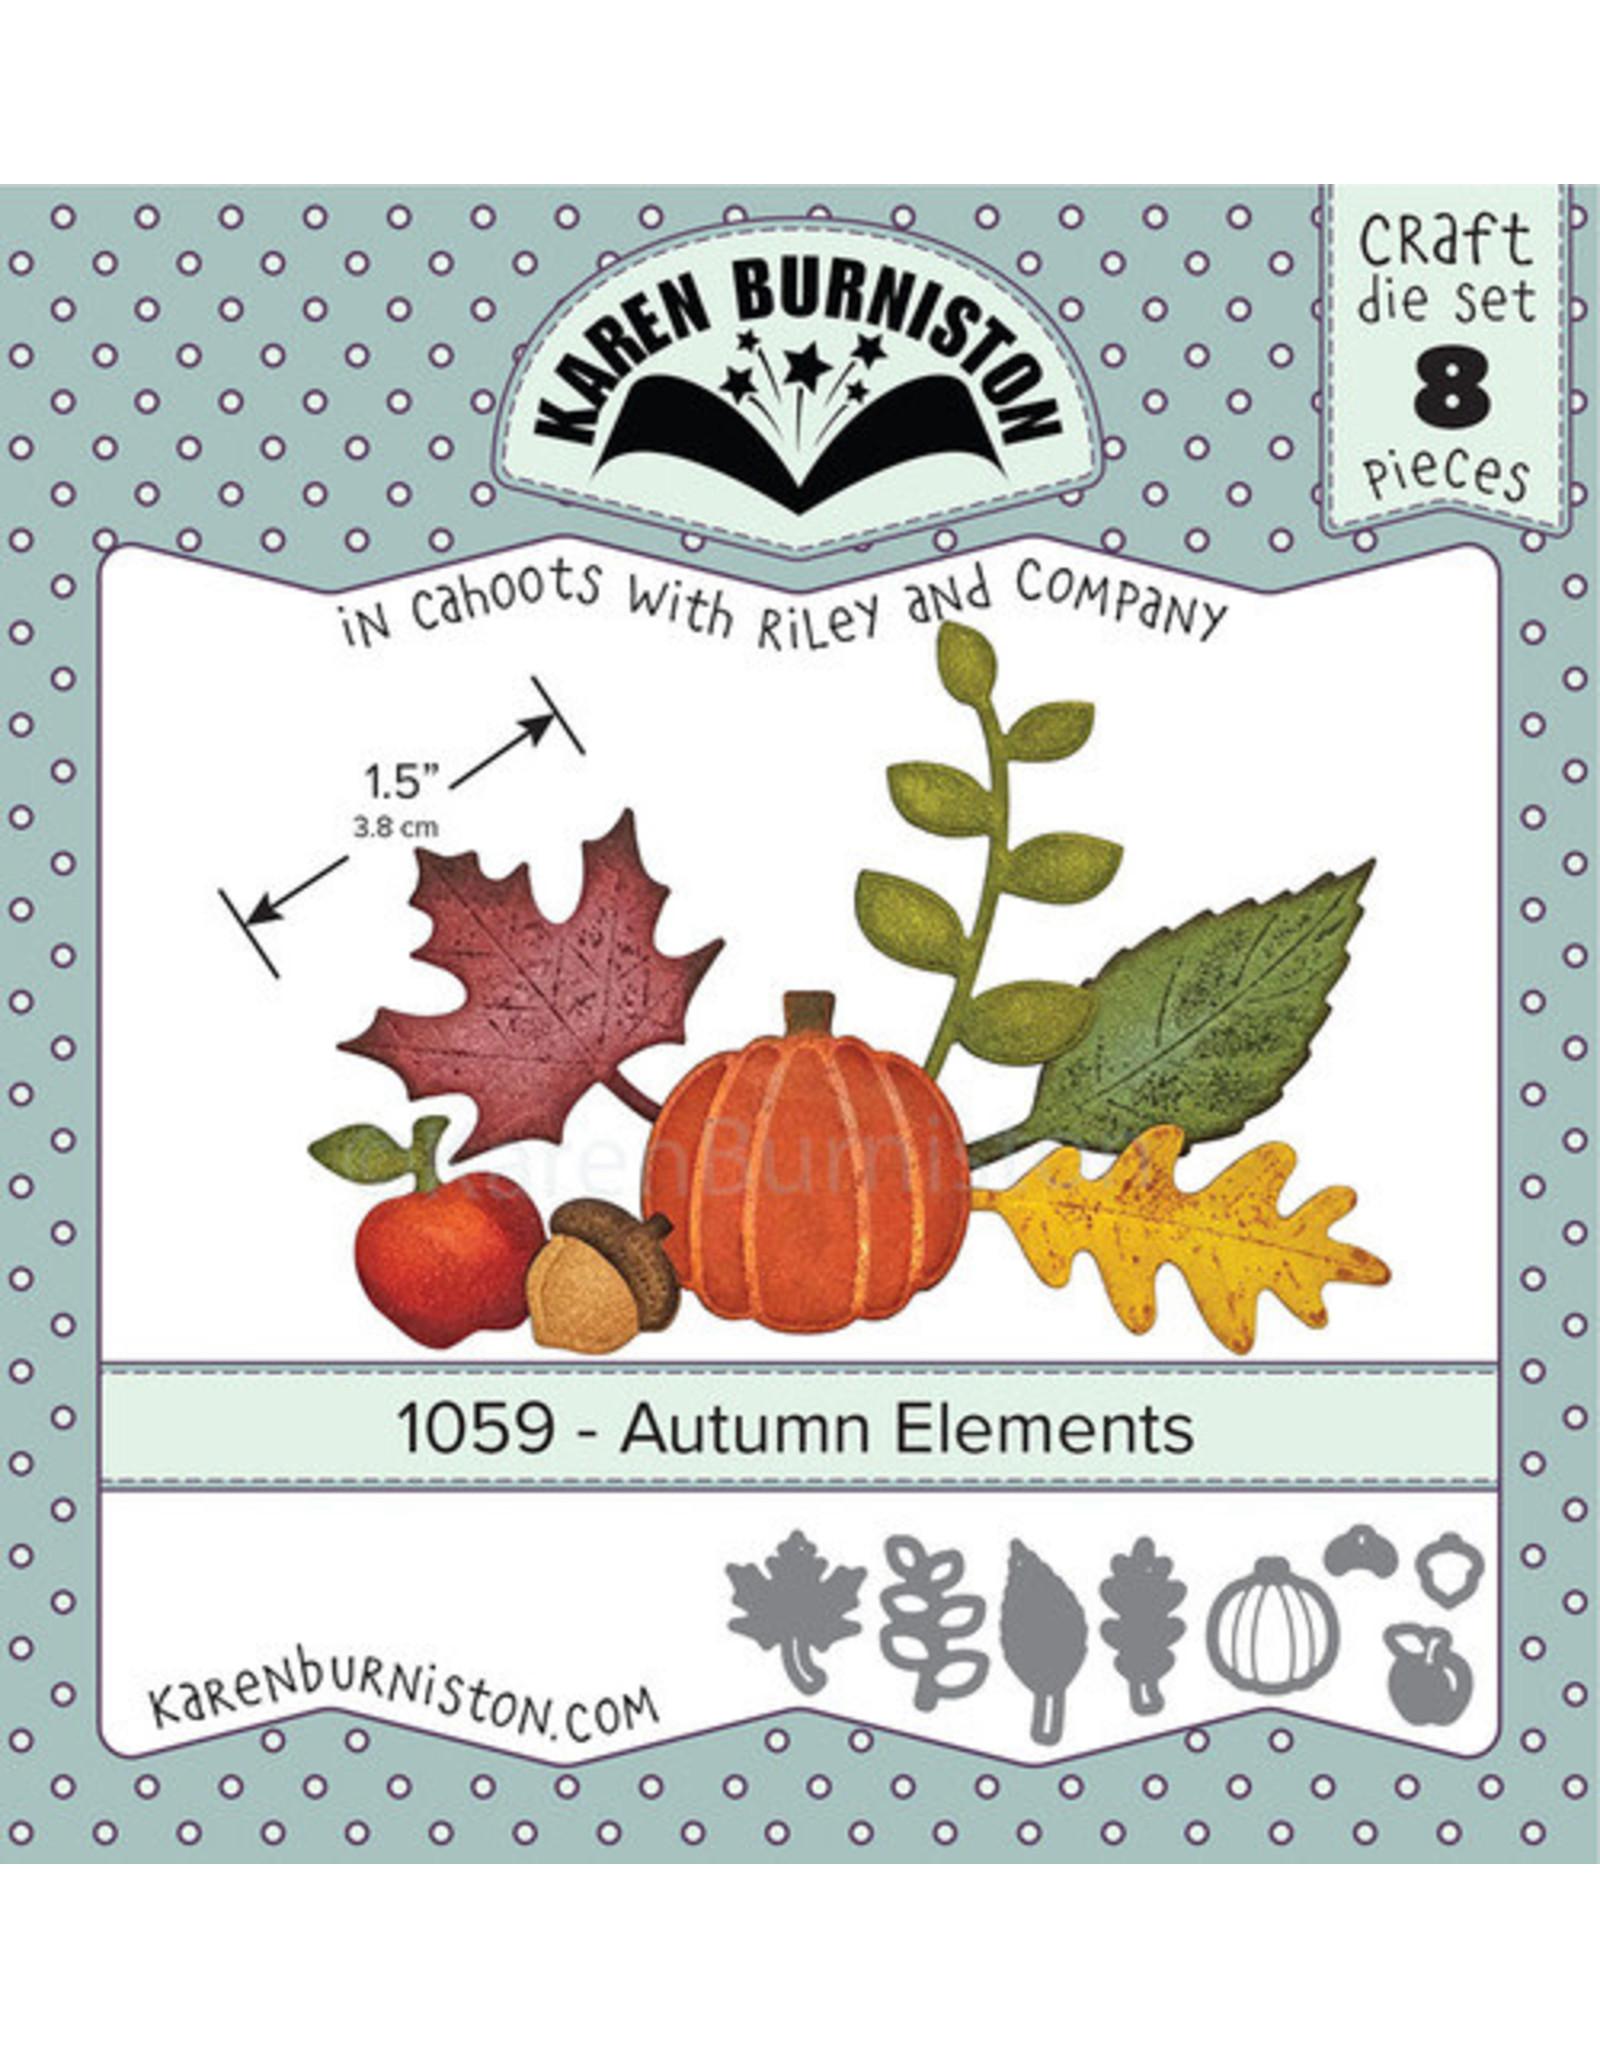 Karen Burniston Autumn Elements